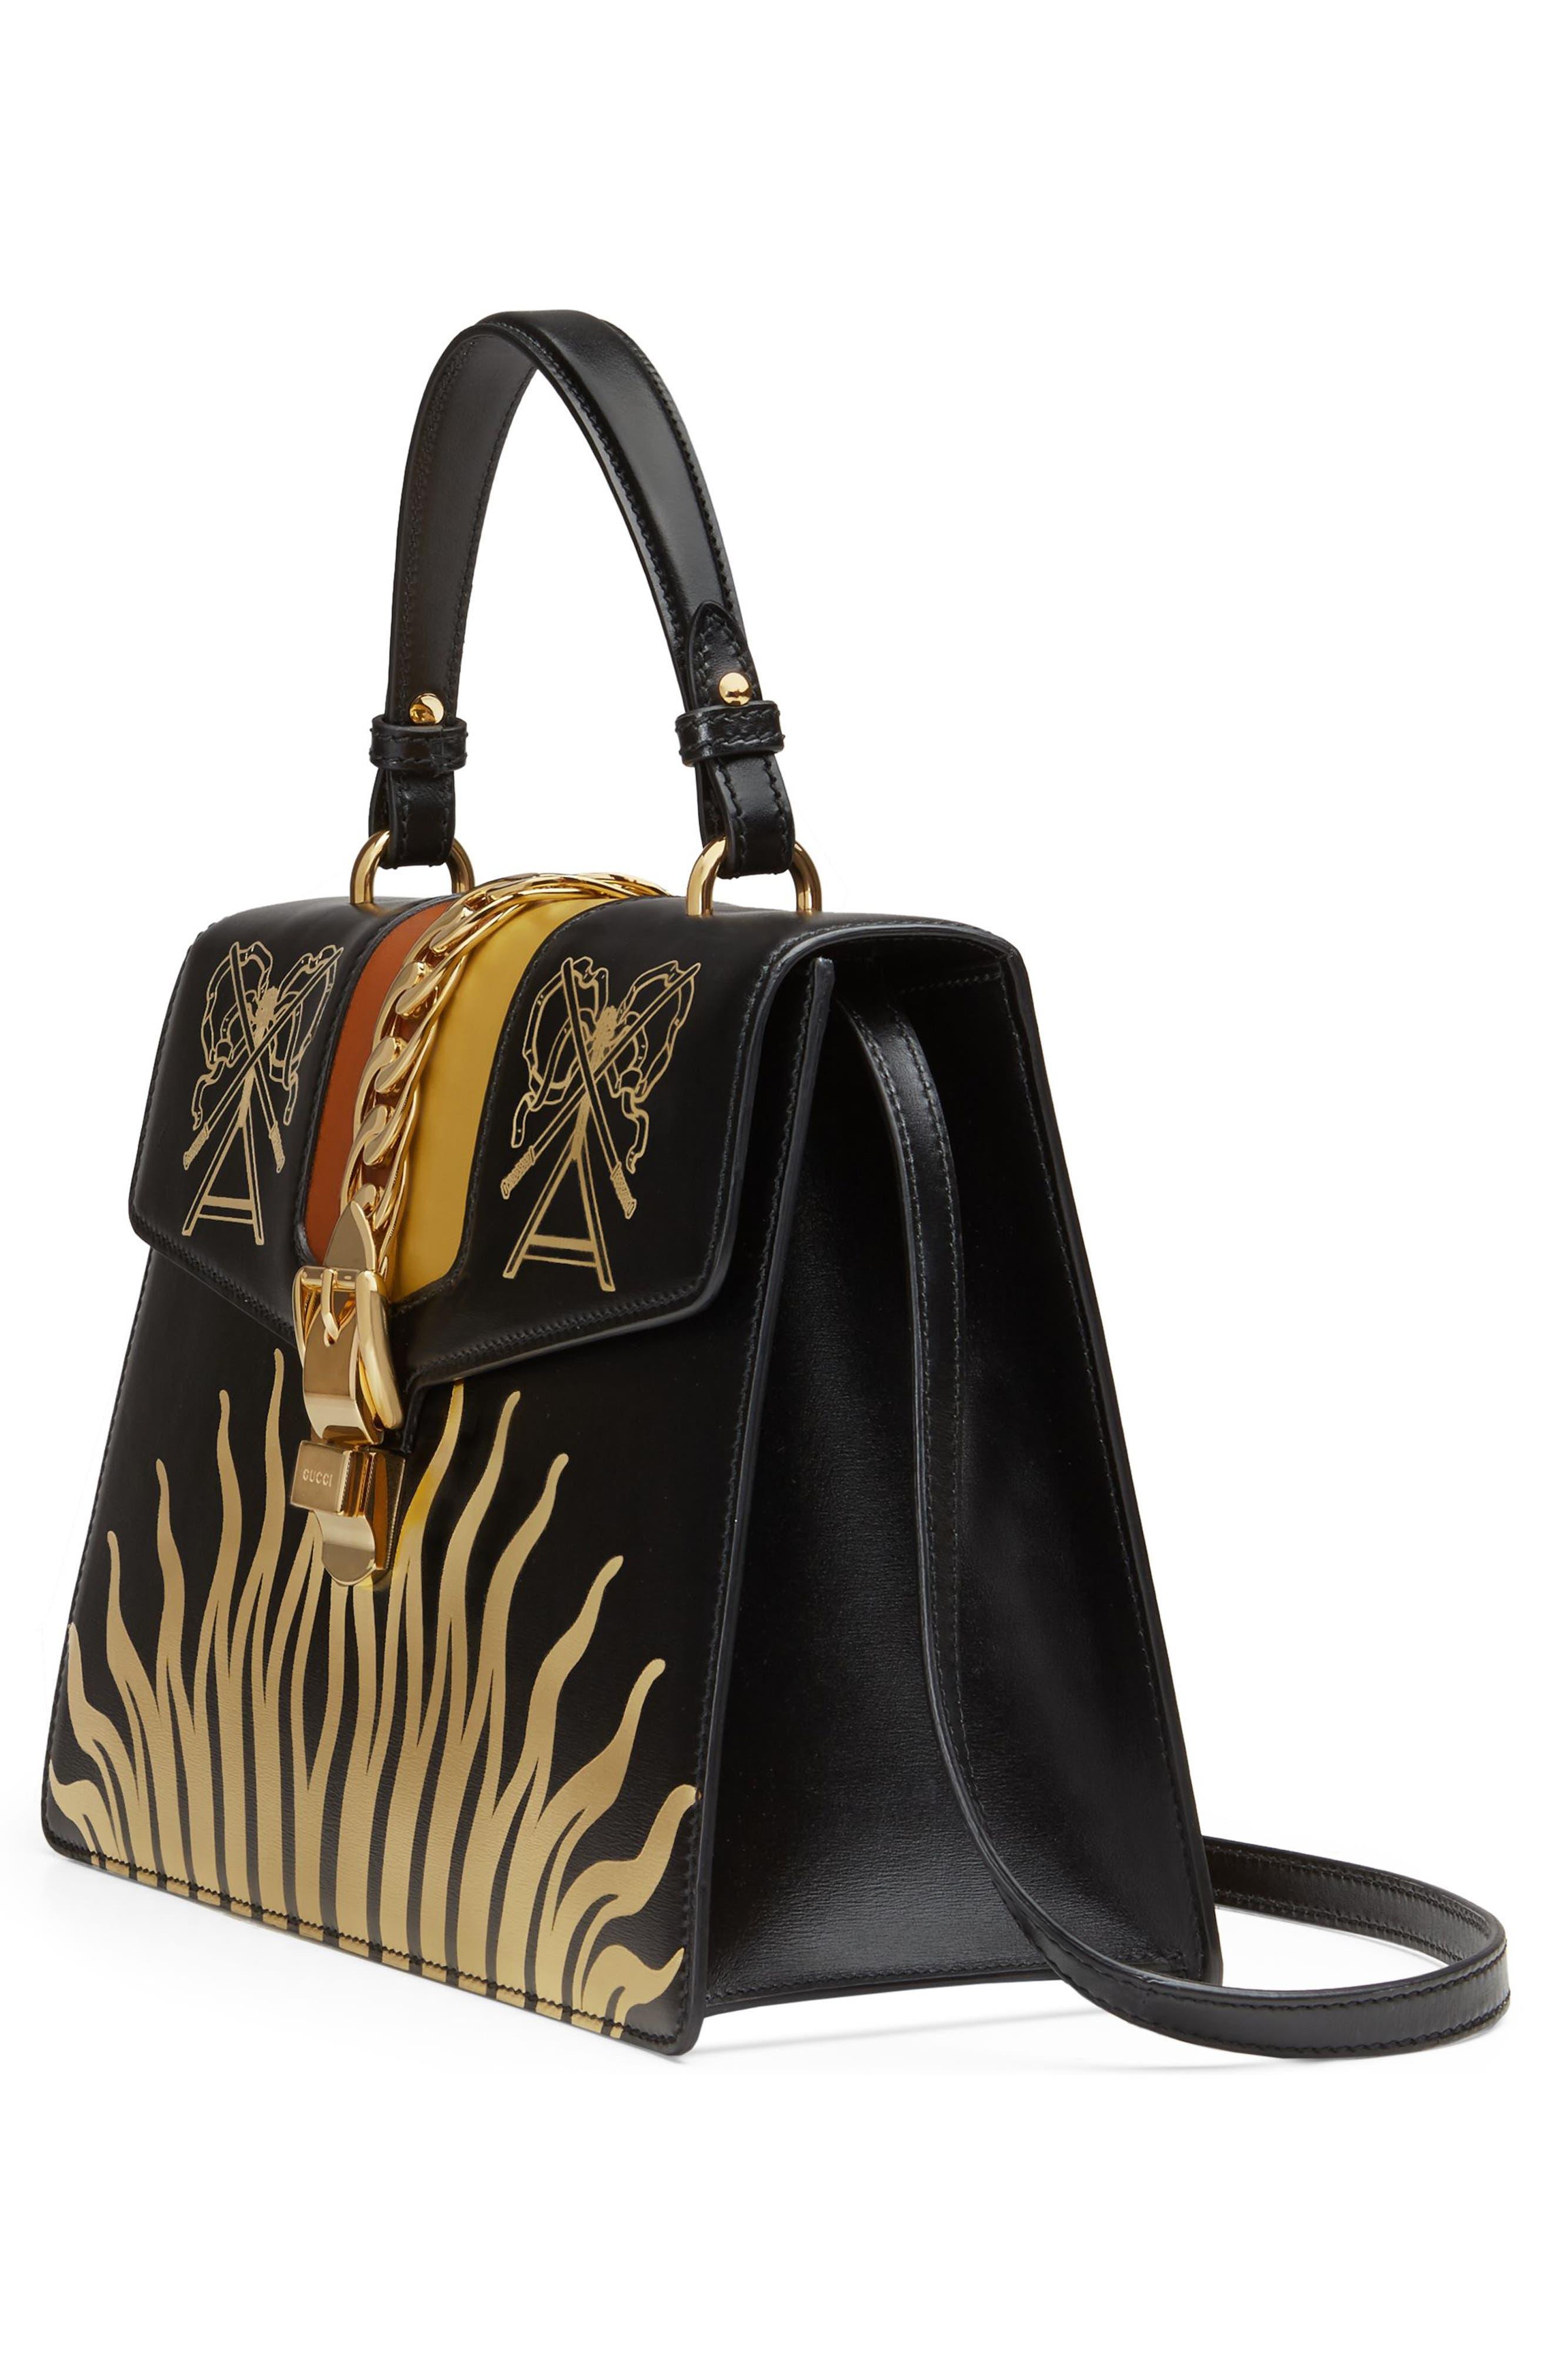 Medium Sylvie Top Handle Leather Bag,                             Alternate thumbnail 4, color,                             BLACK GOLD/ CARAMEL/ OCHRE